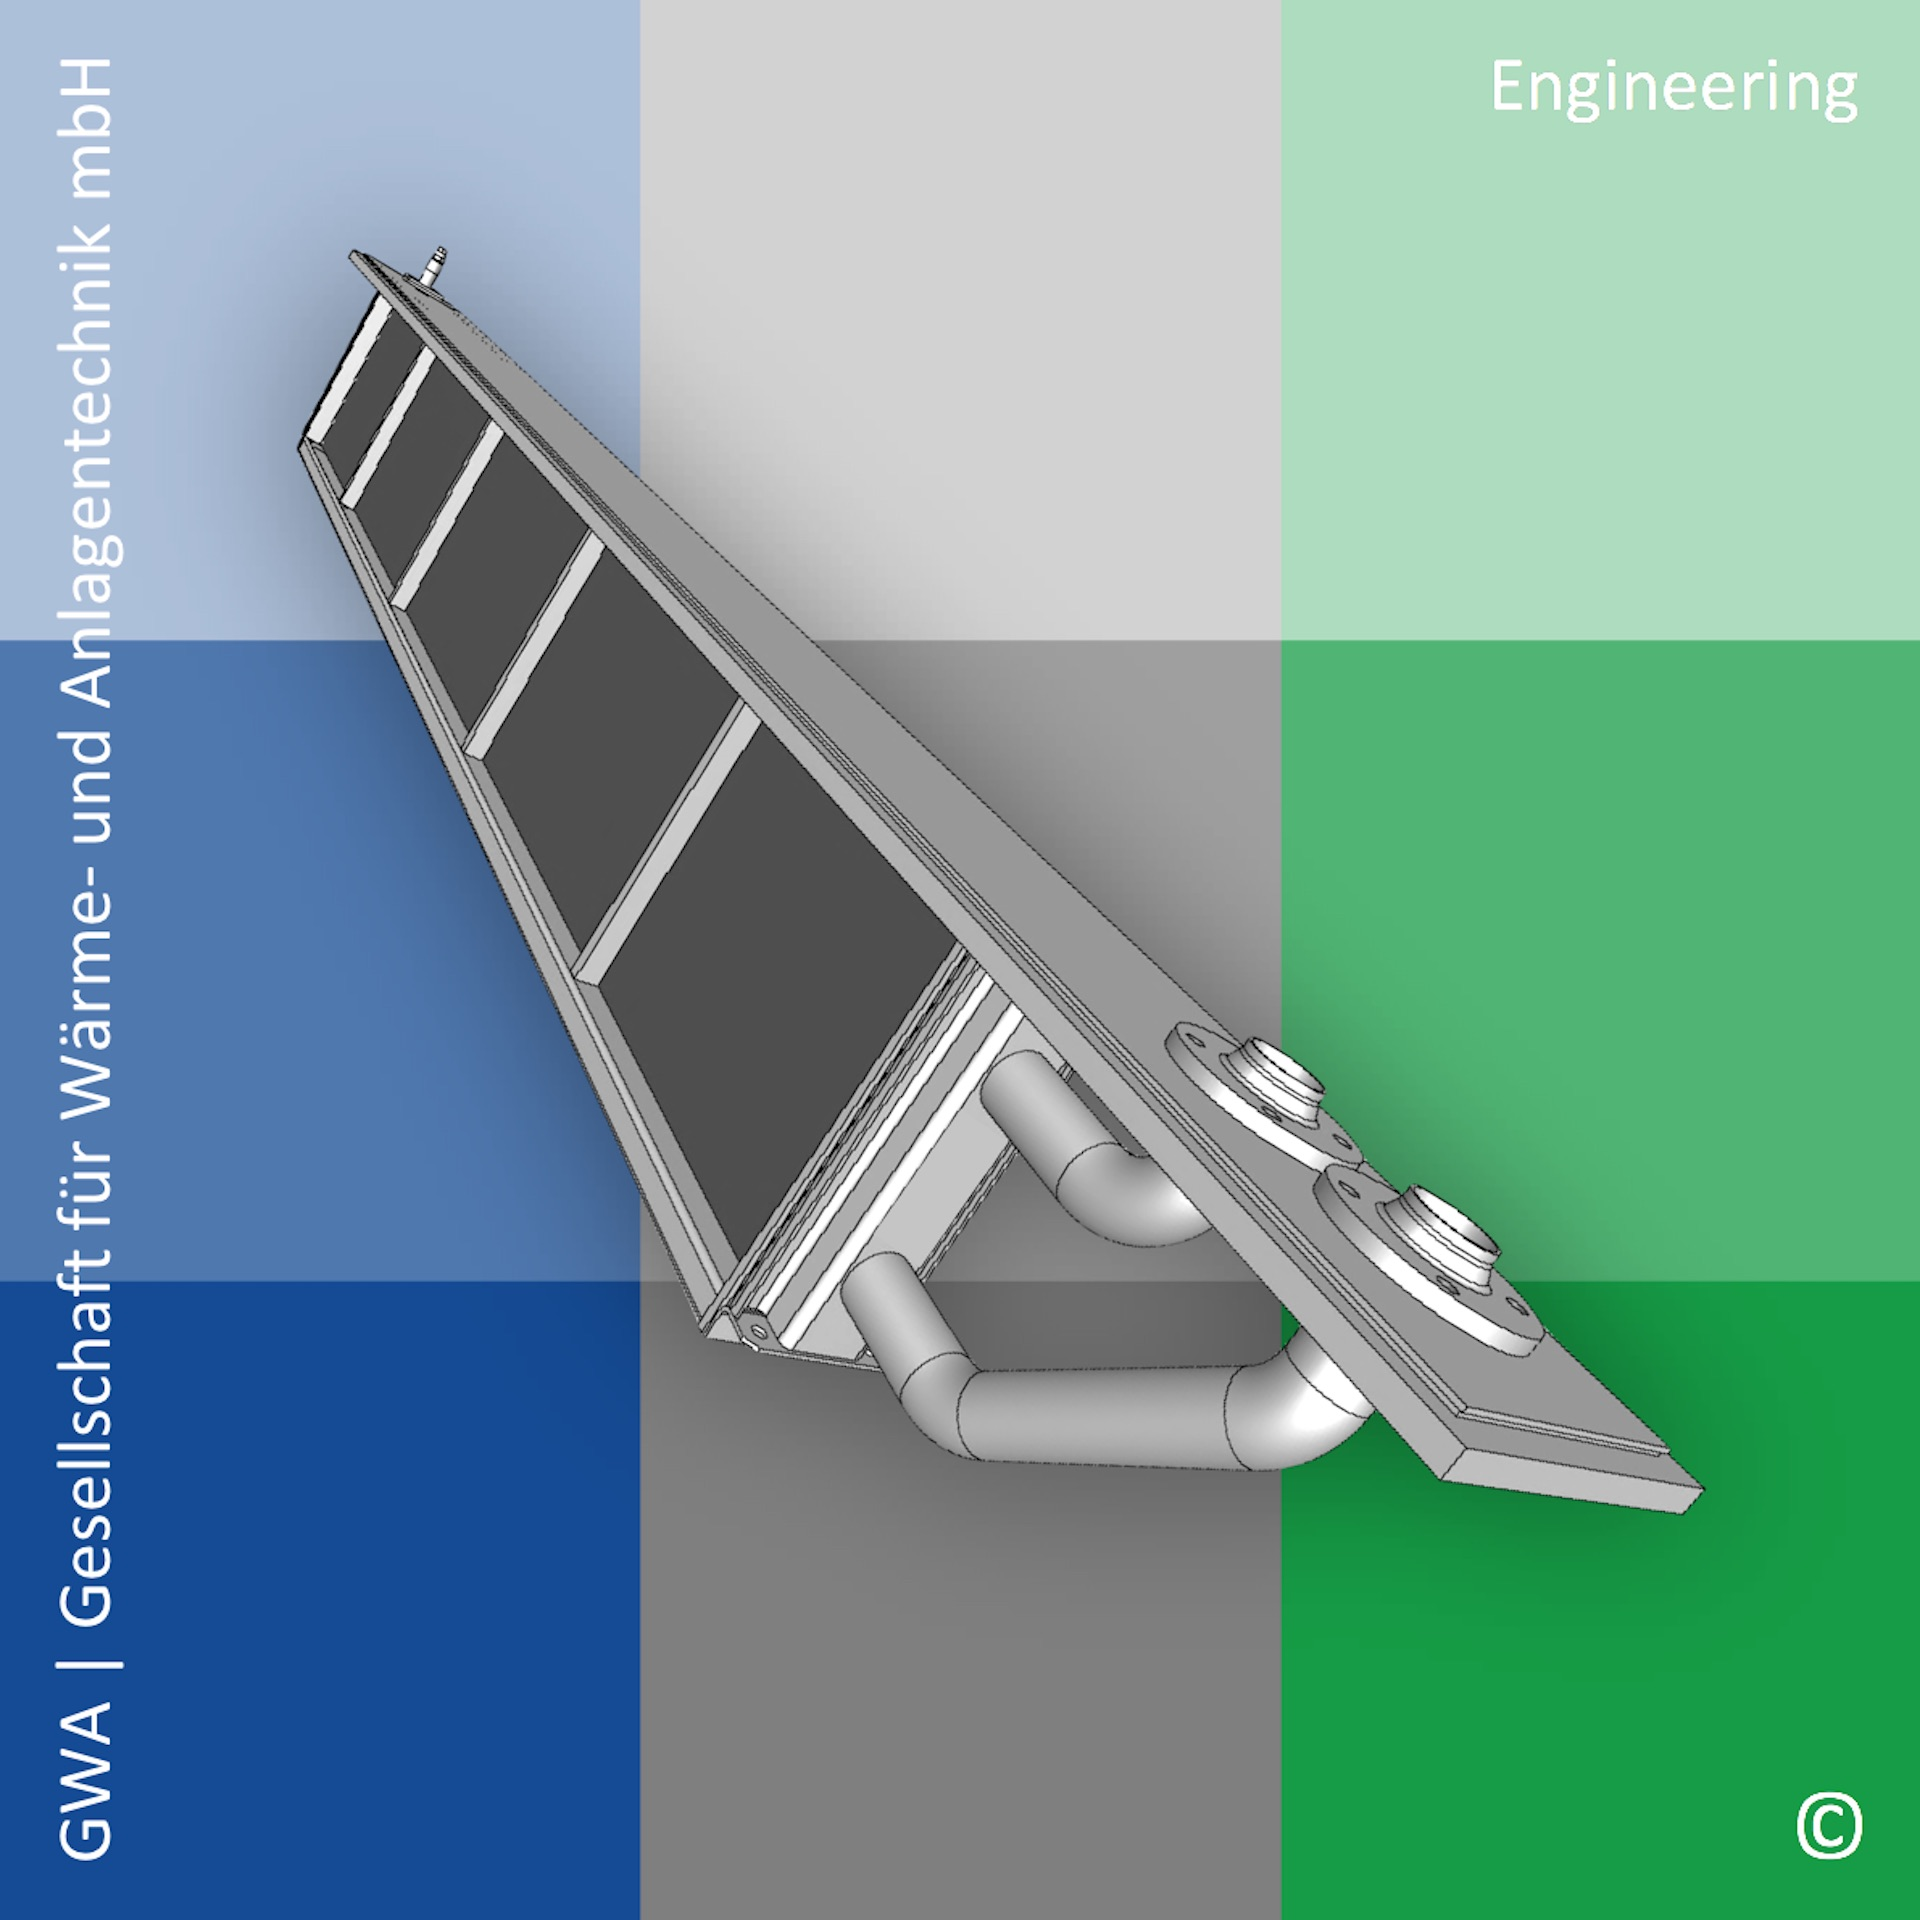 GWA_engineering_heat_exchanger_cooler_for_electrical_machines_circulation_cooler_for_ring_motors_Gesellschaft_fuer_Waerme_und_Anlagentechnik_mbH